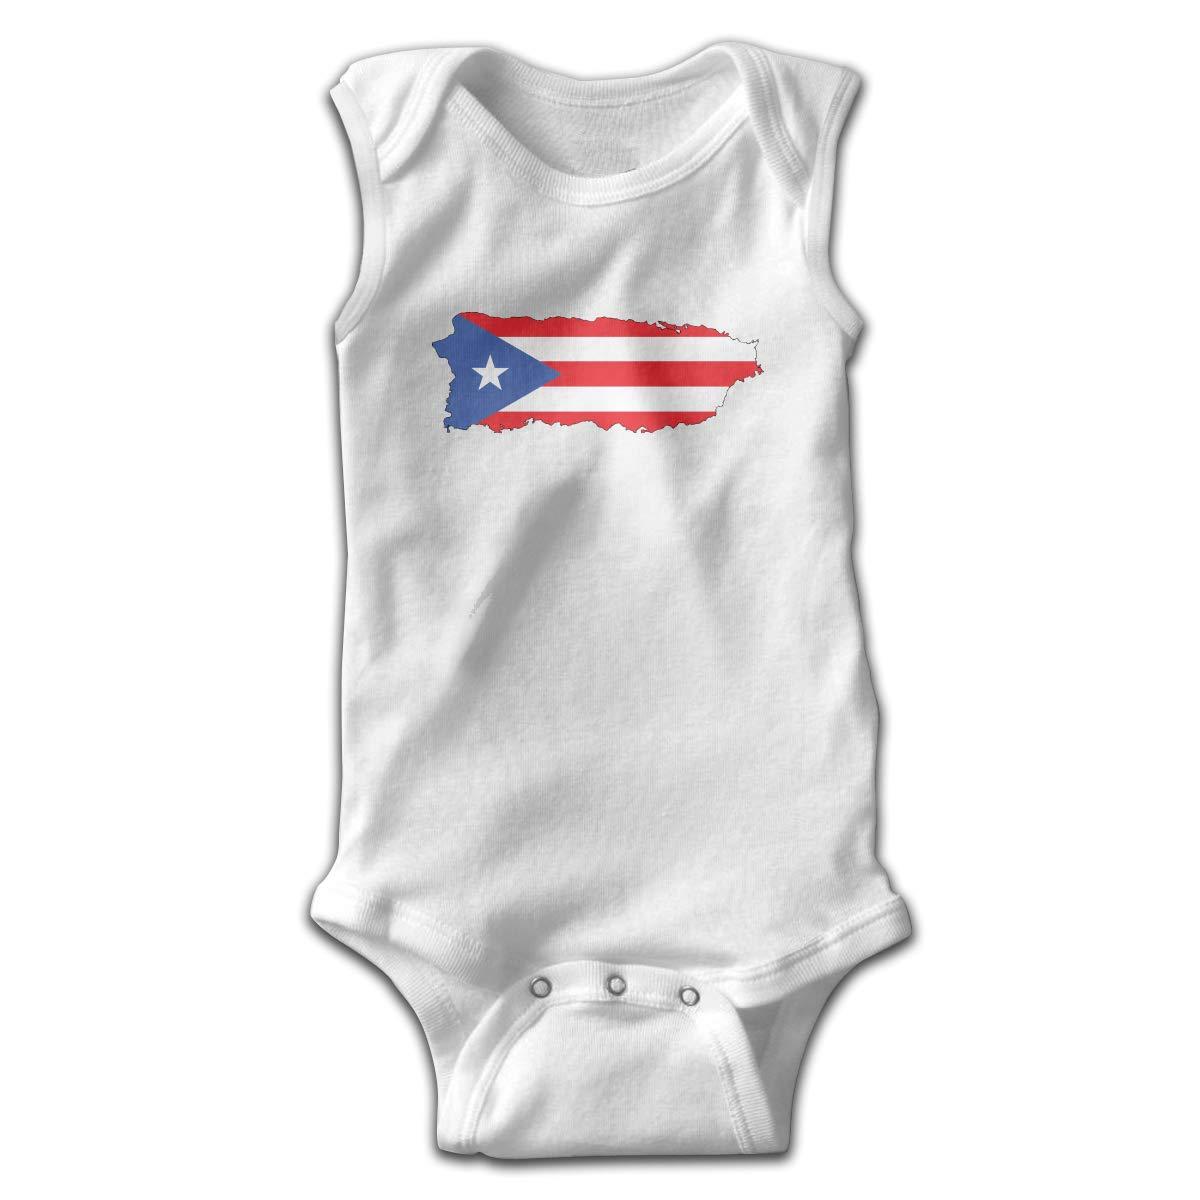 HR Puerto Rico Flag Smalls Baby Onesie,Infant Bodysuit Black